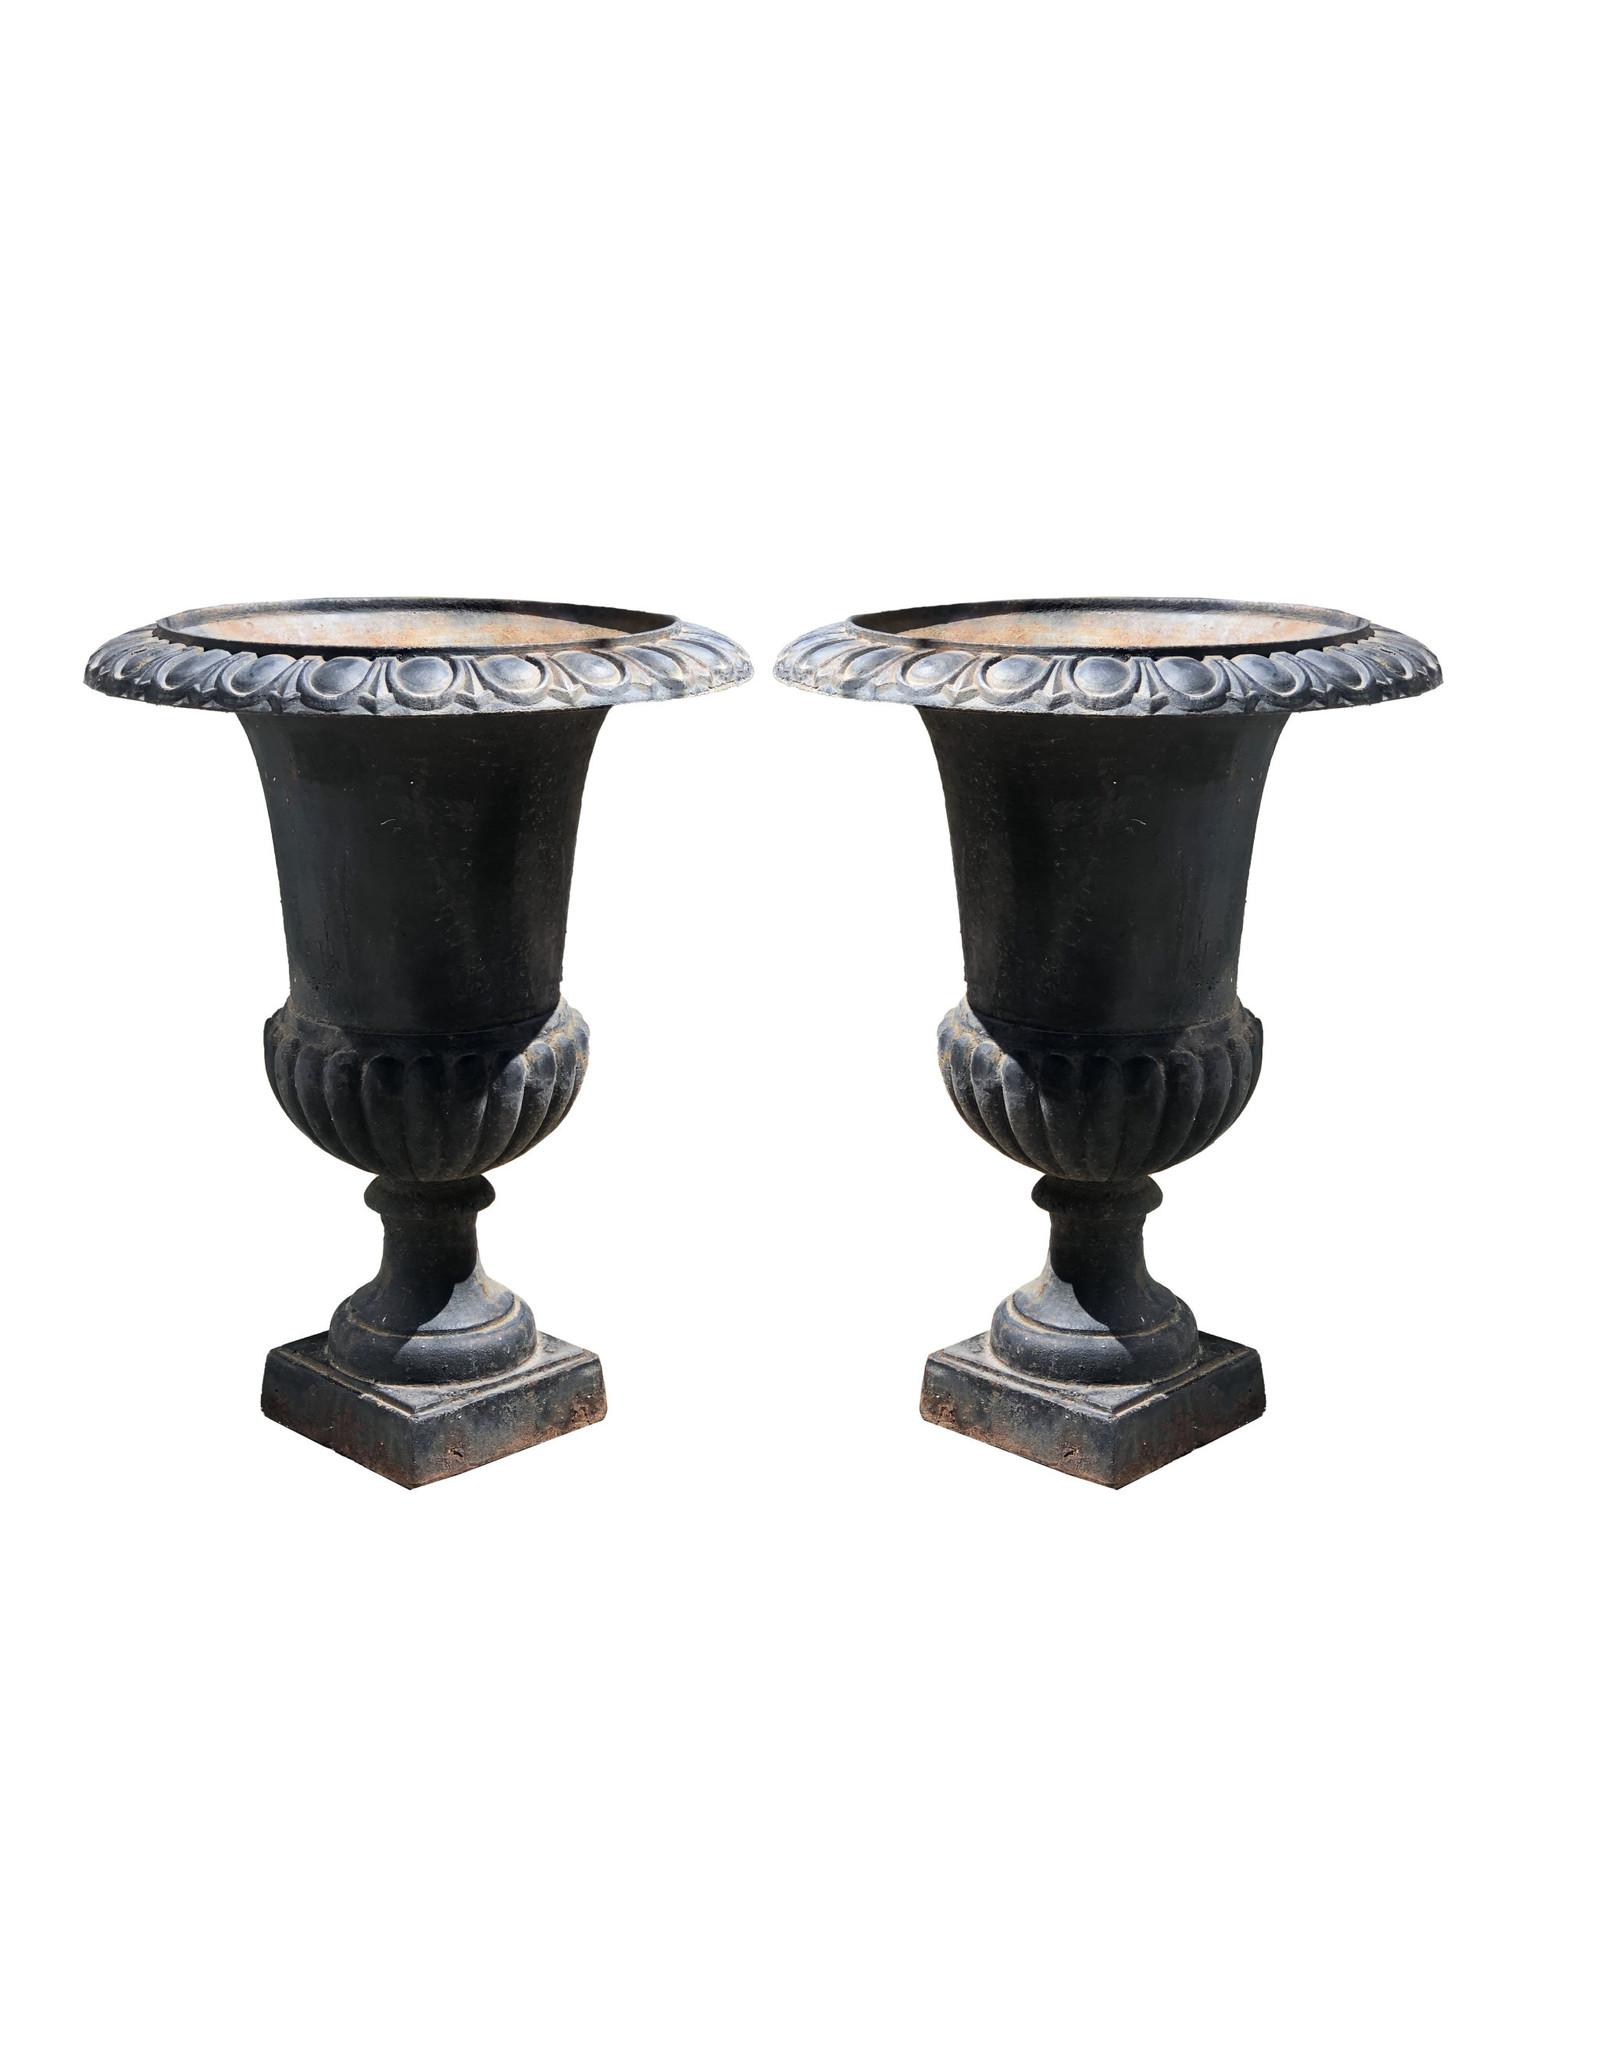 Vintage Black Cast Iron Neoclassical Urn Planters (Pair)